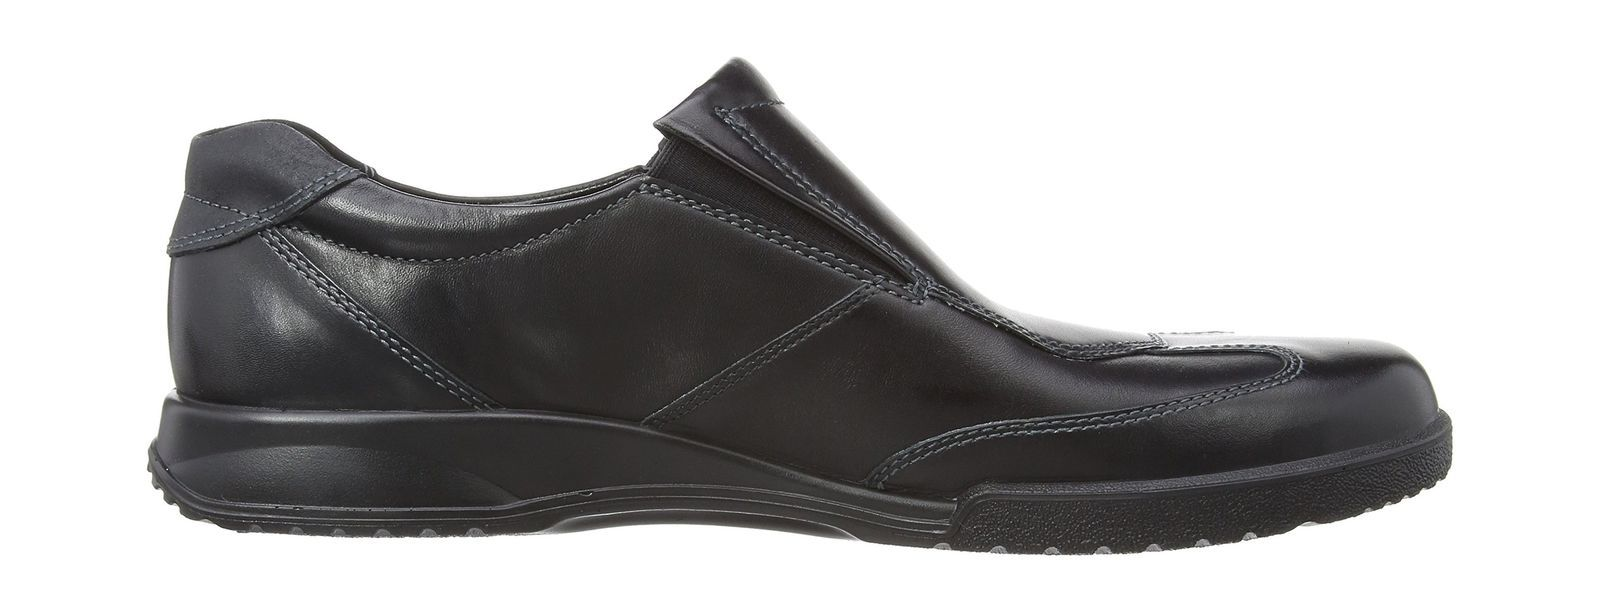 Transporter, Mens Oxford Shoes Ecco